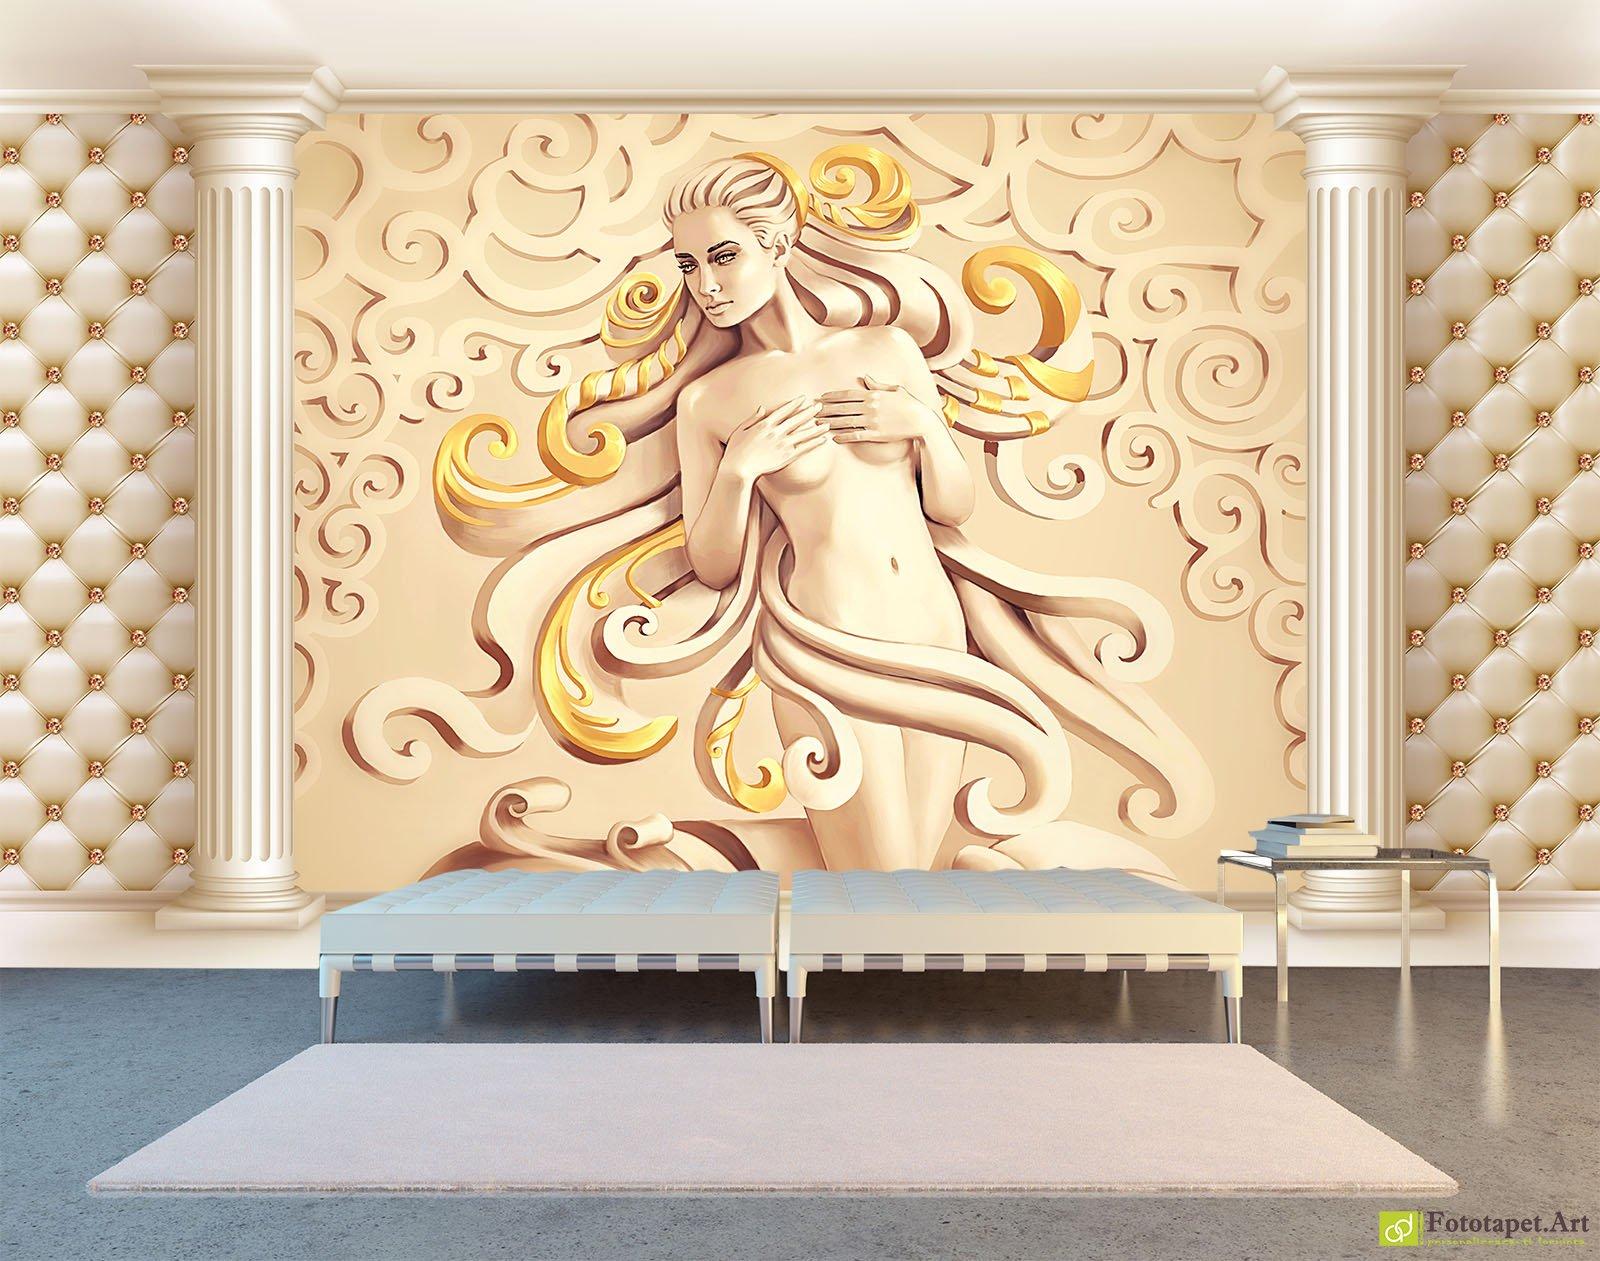 Photo Wallpaper 3D Effect - Venus, Fantasy_10 | Fototapet.art ...